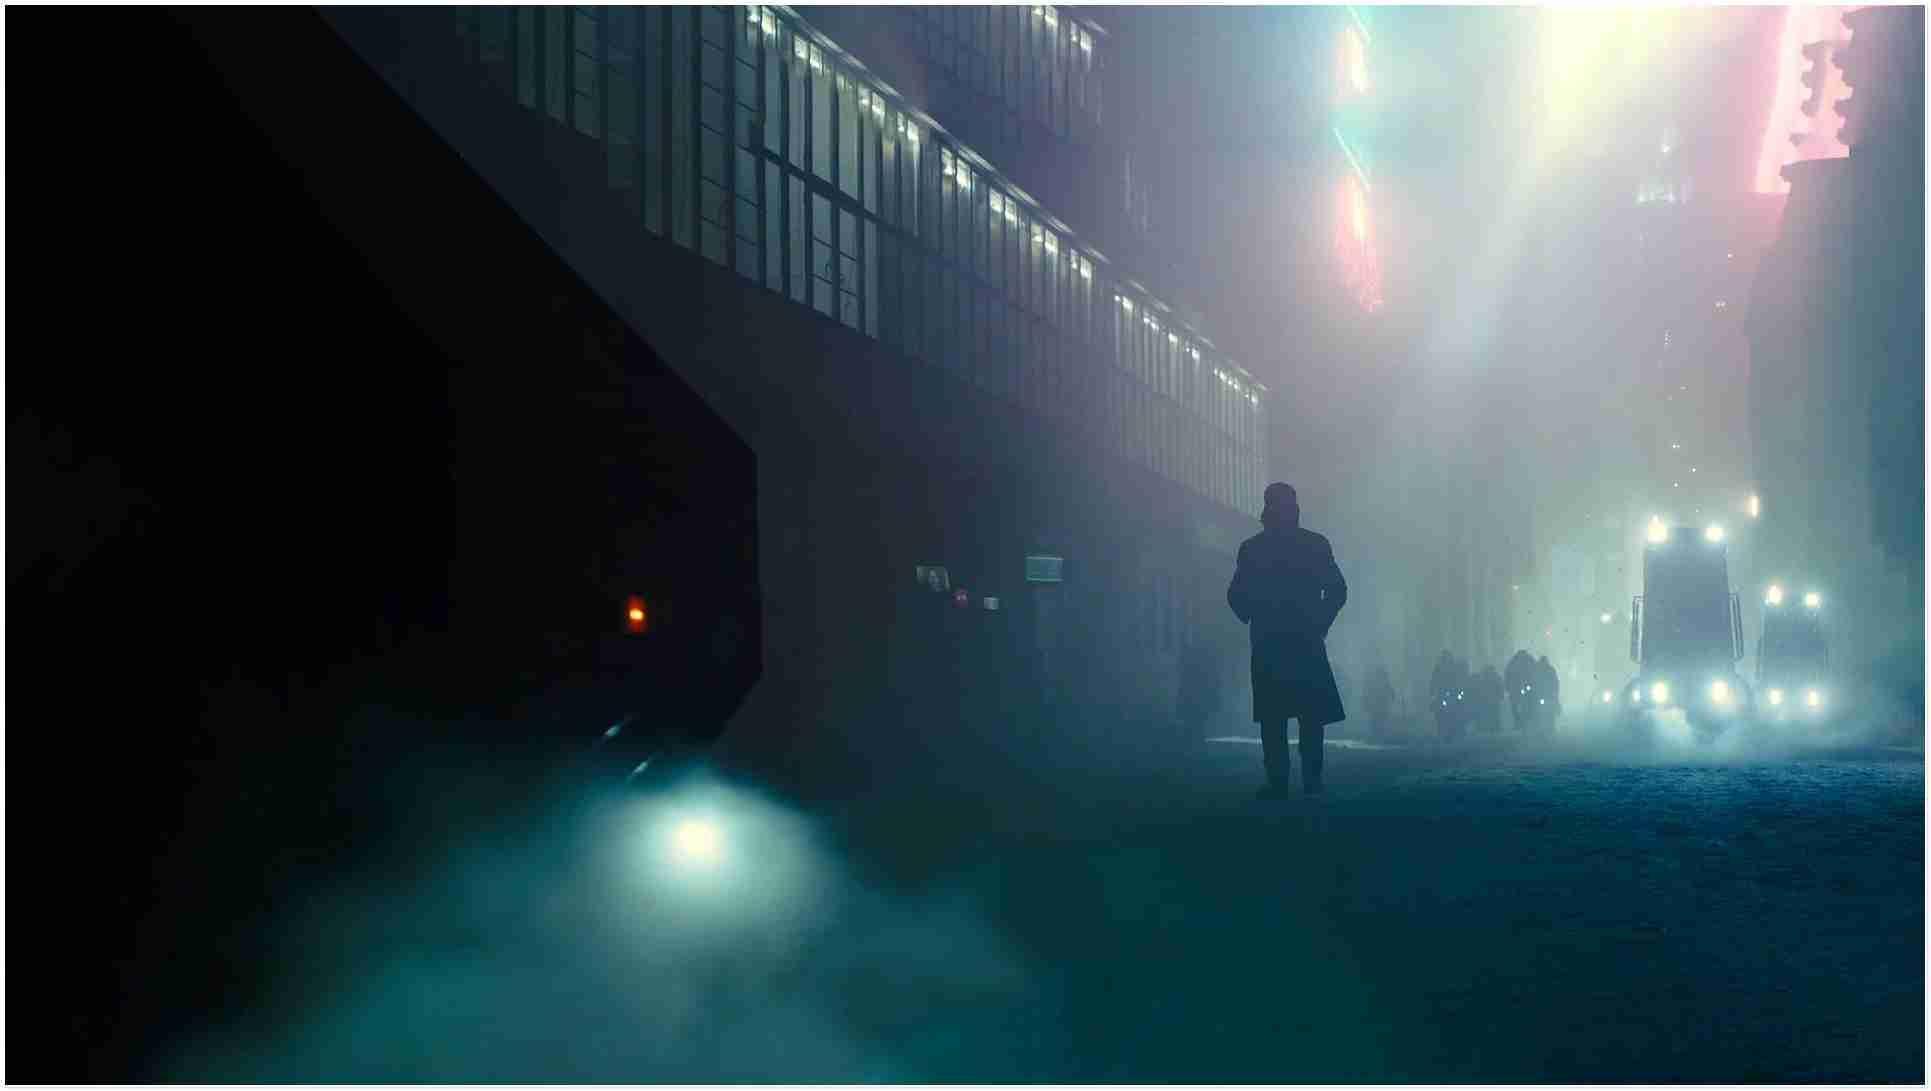 New 20 Blade Runner Wallpapers Blade Runner Wallpaper Blade Runner Desktop Background Nature